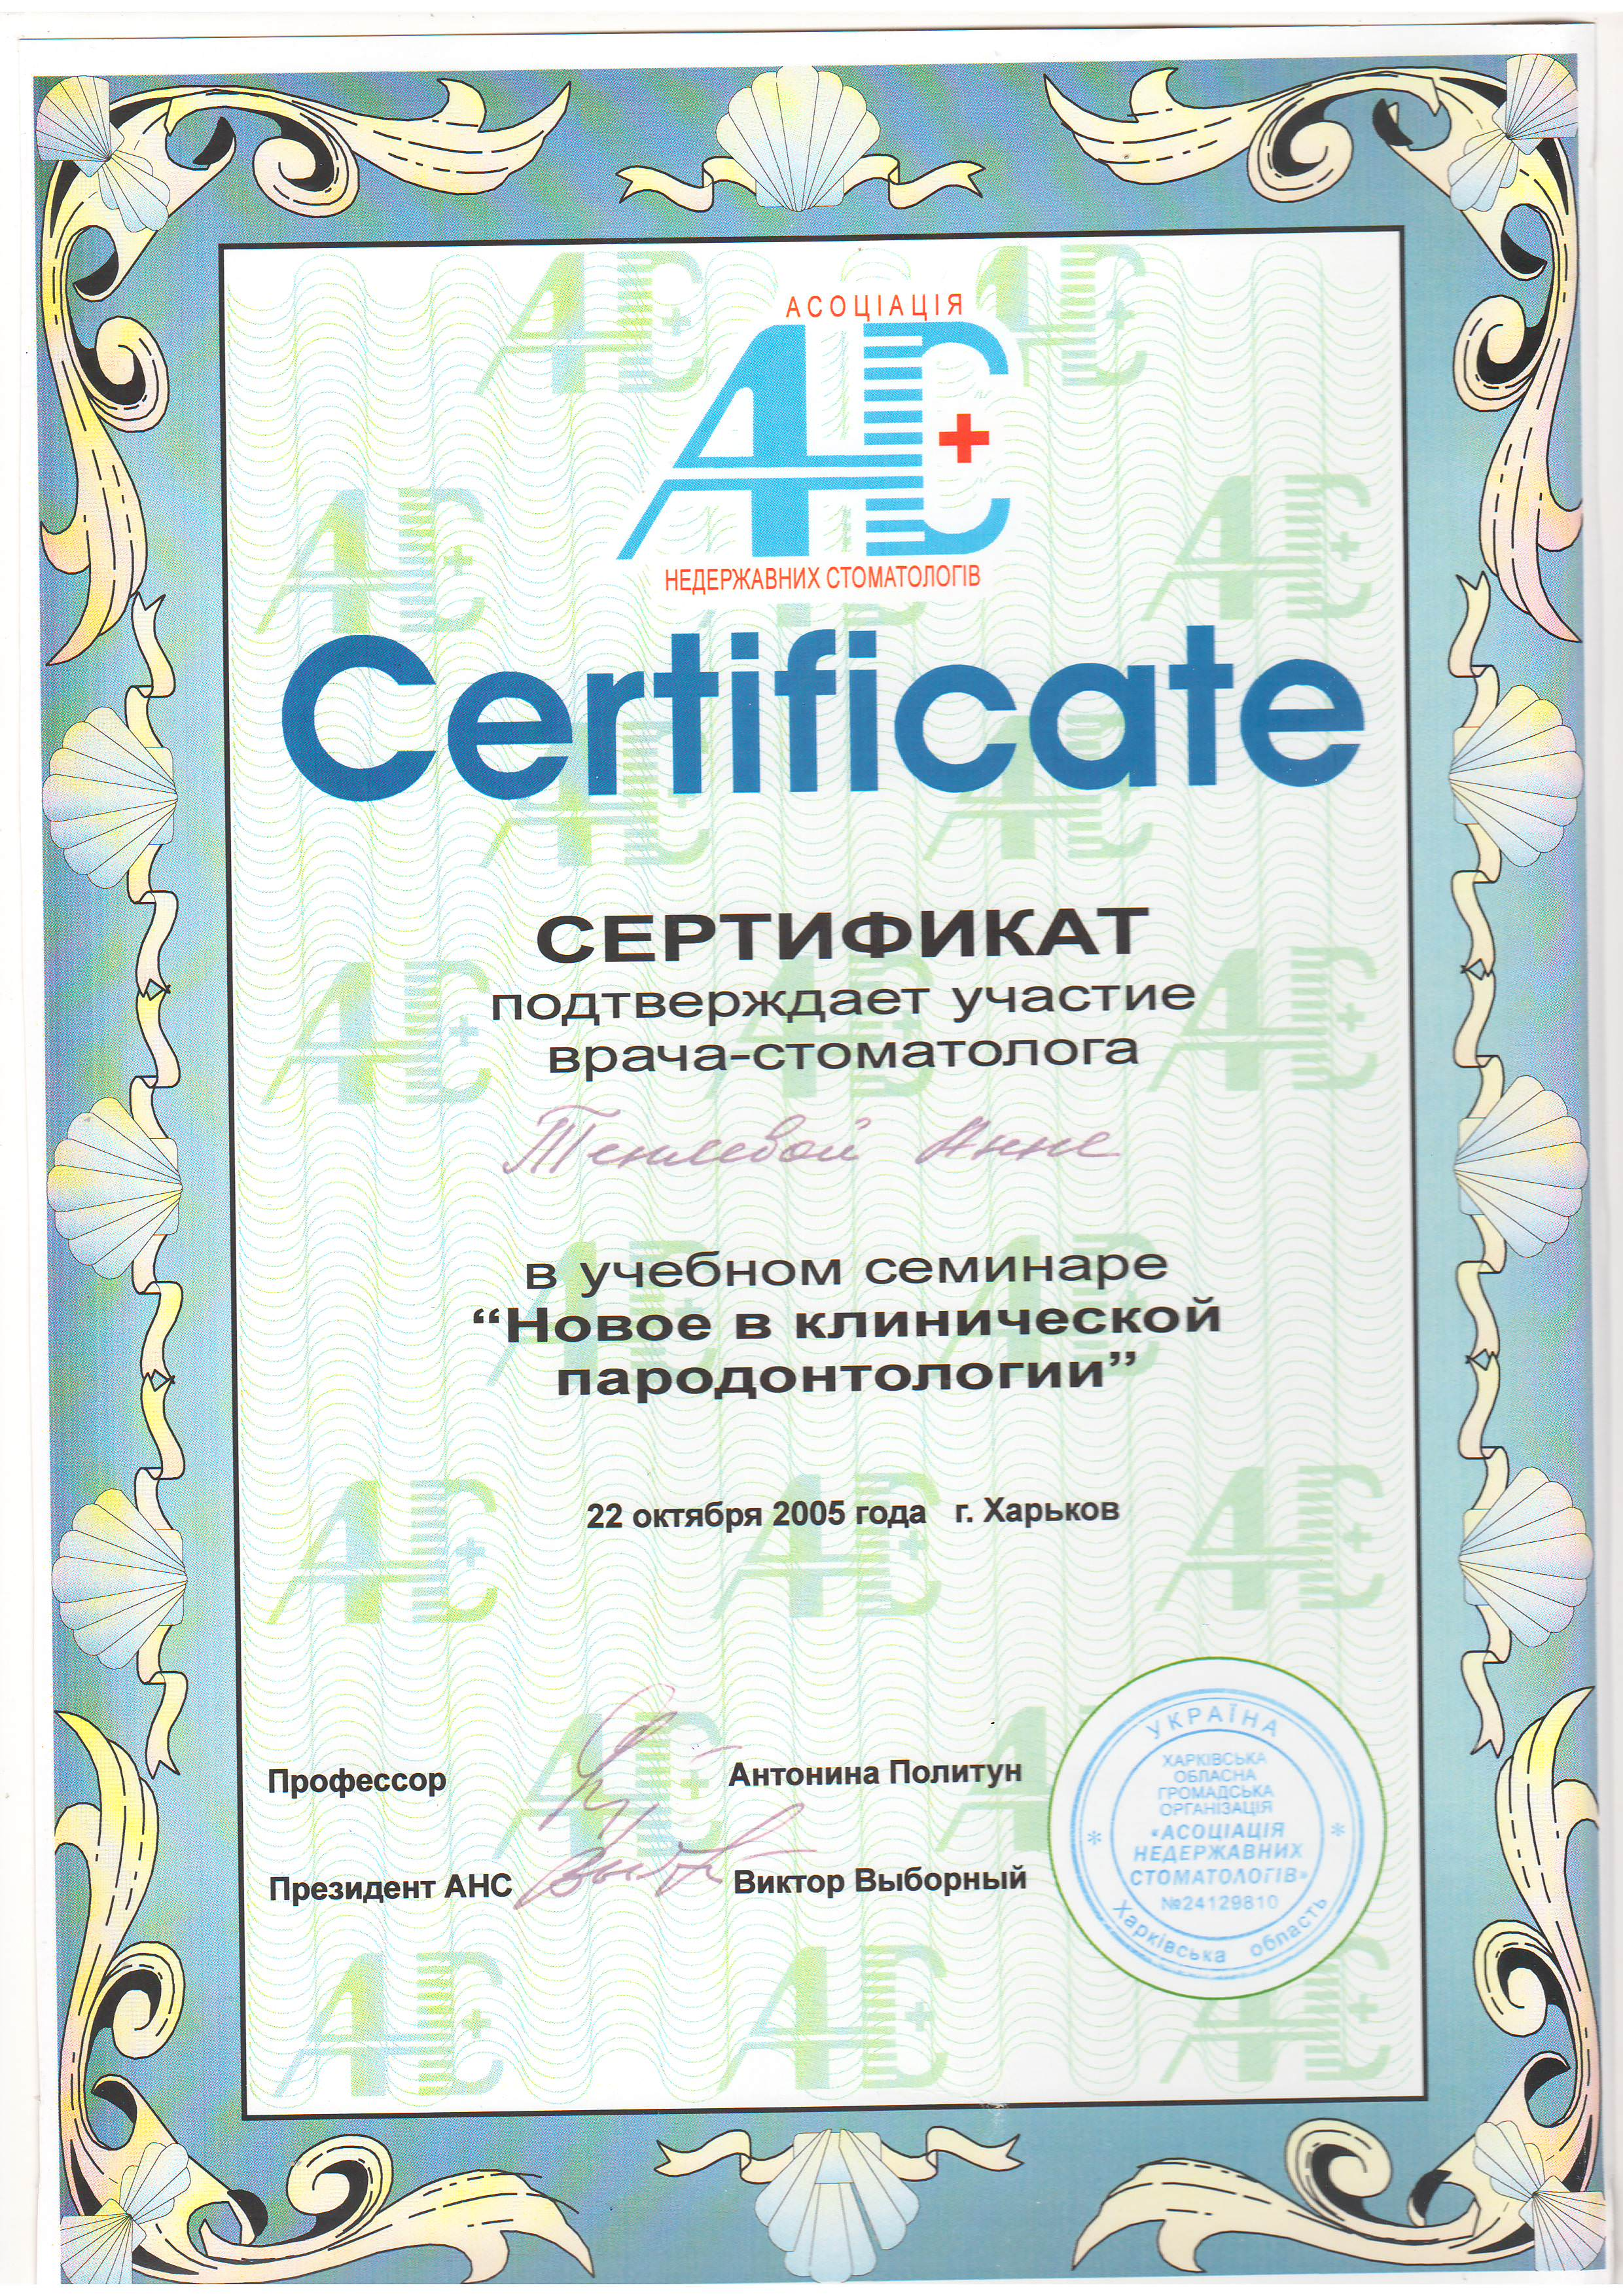 Сертификат 72